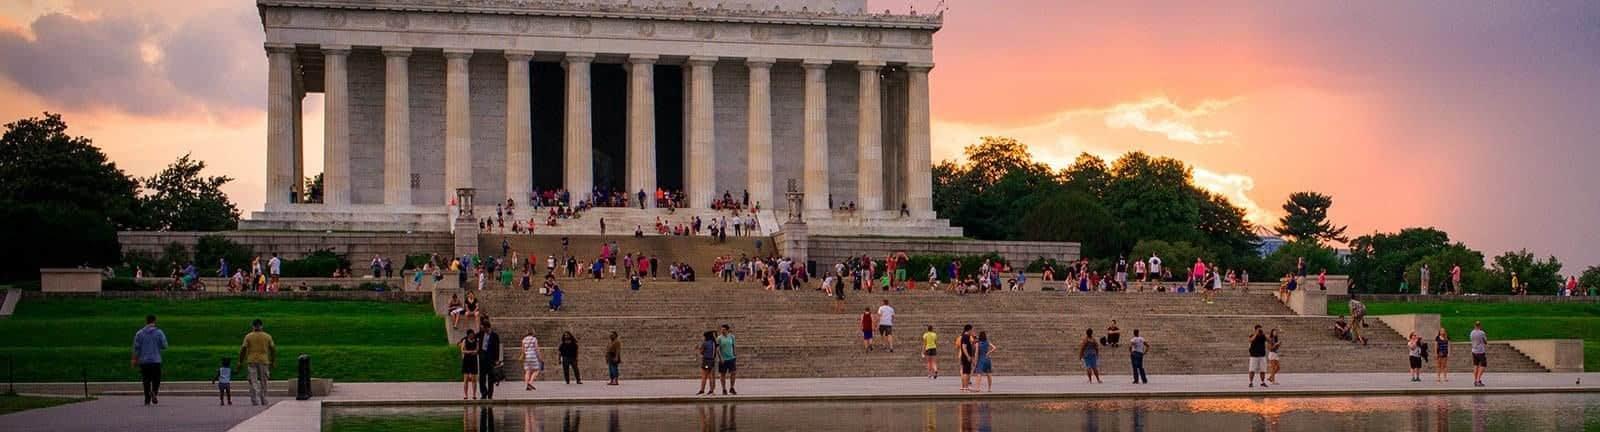 Usa Guided Tours Washington Dc Tour Company